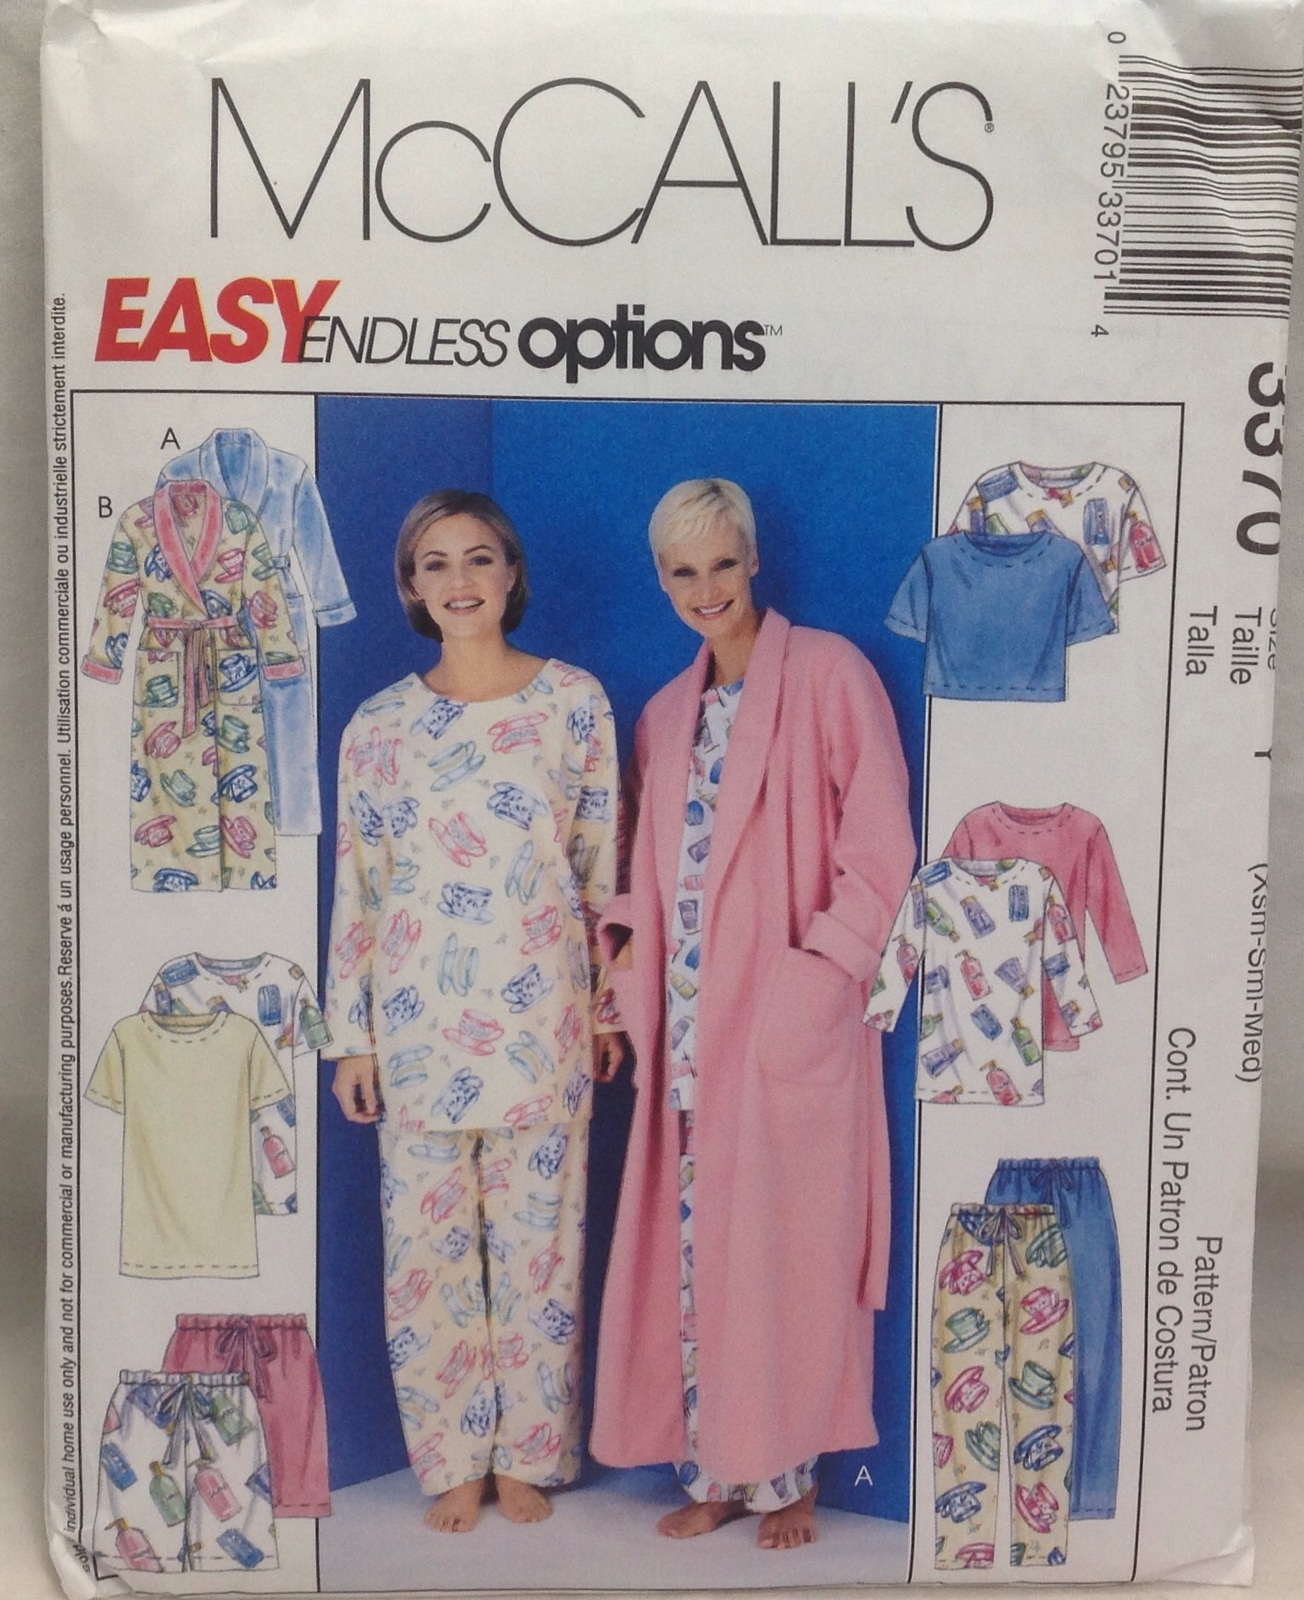 Mccalls Pattern Sleepwear 3370 Sz Y and 21 similar items a25e83d69